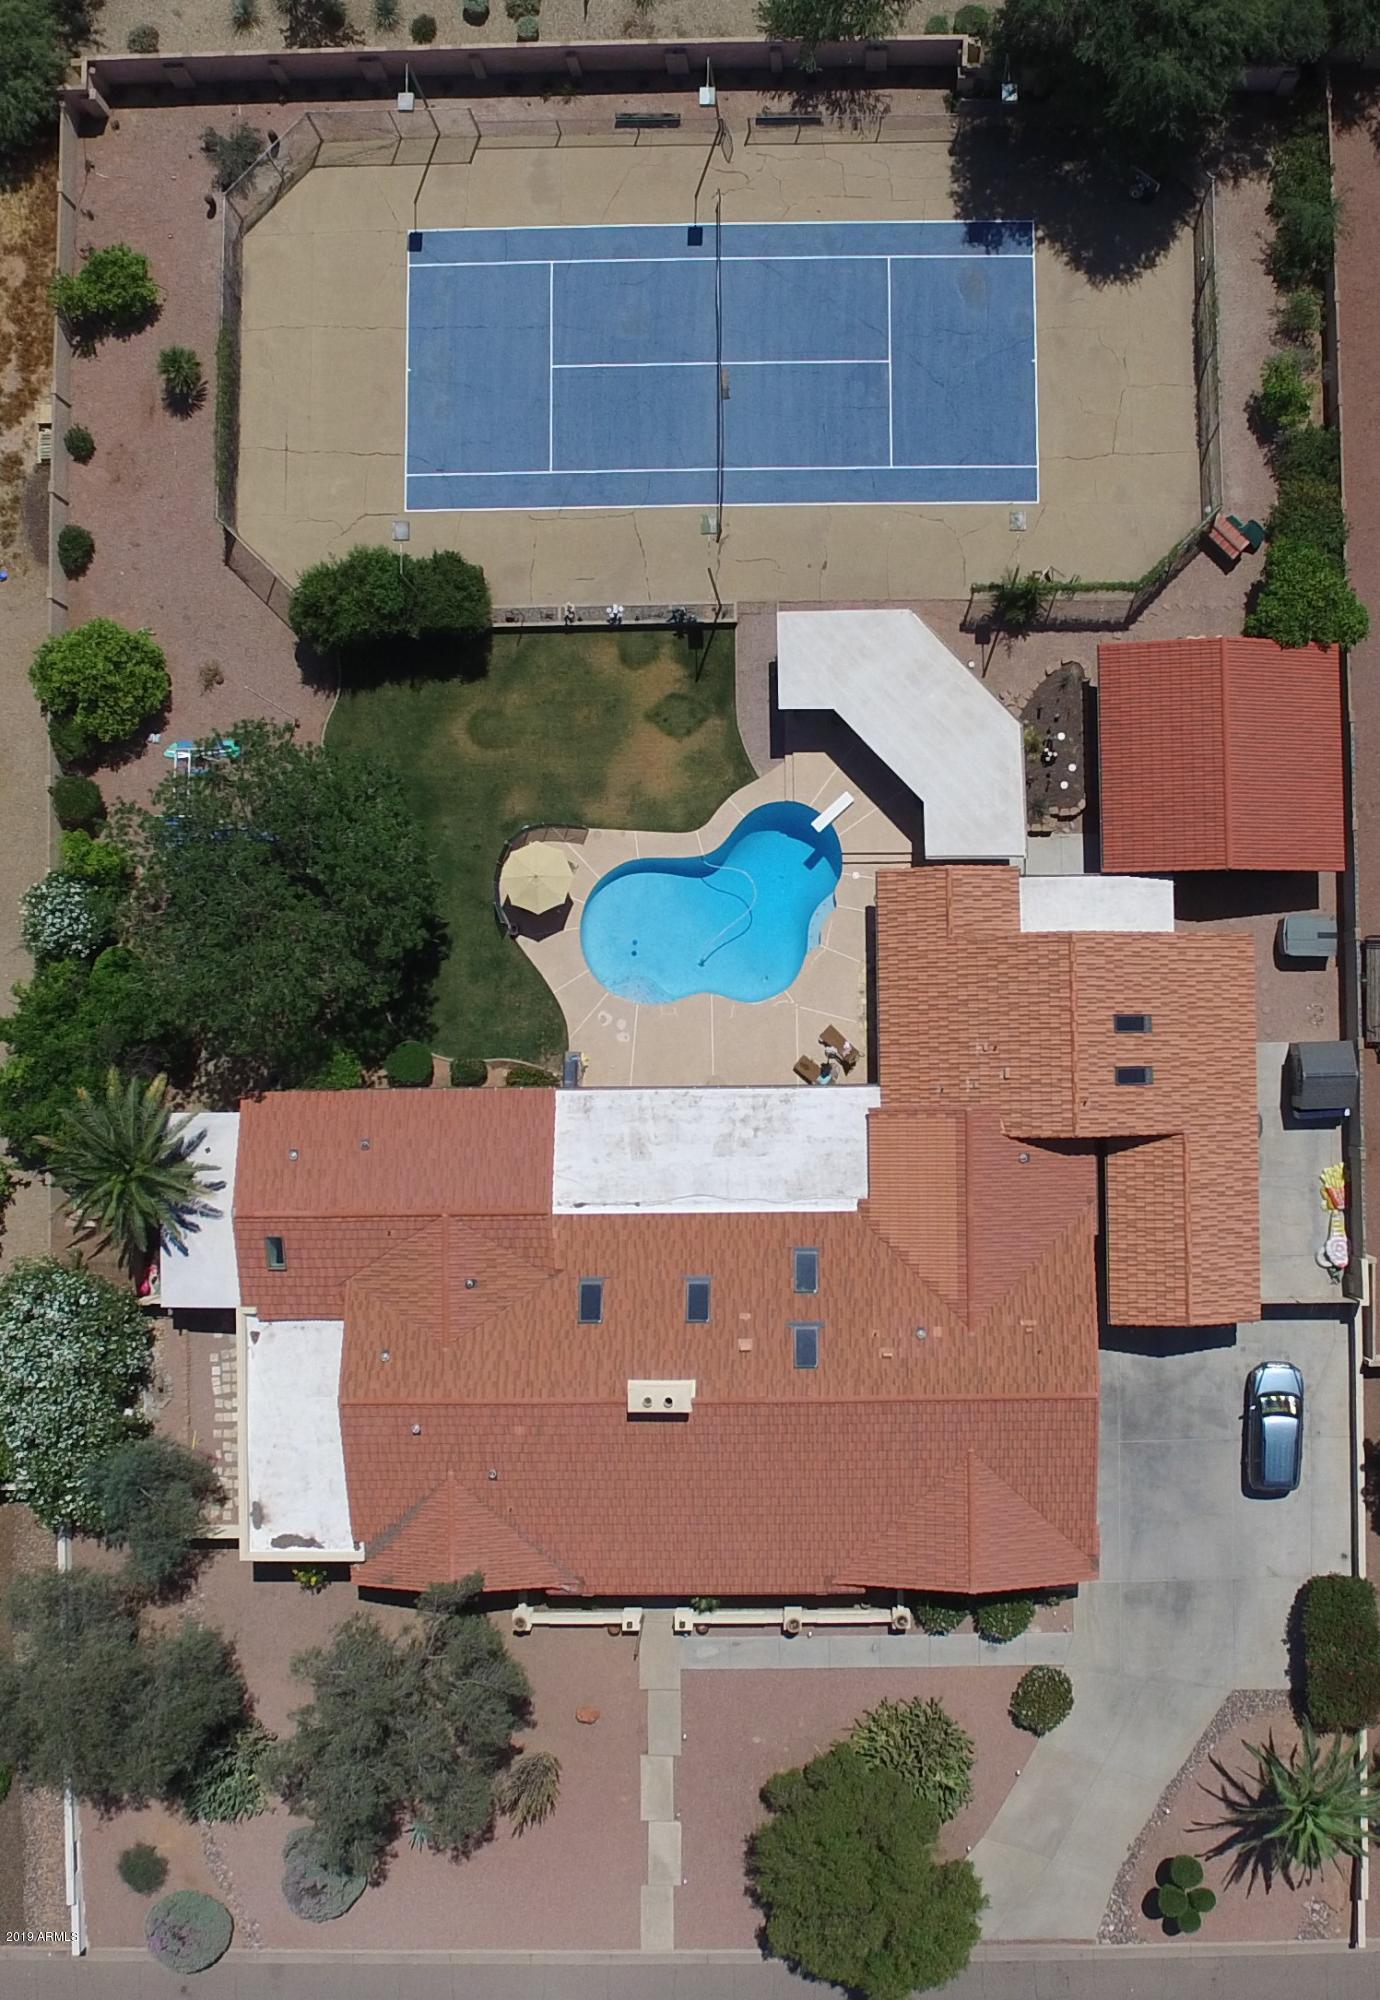 MLS 5936269 12253 N 79TH Street, Scottsdale, AZ 85260 Scottsdale AZ Private Pool